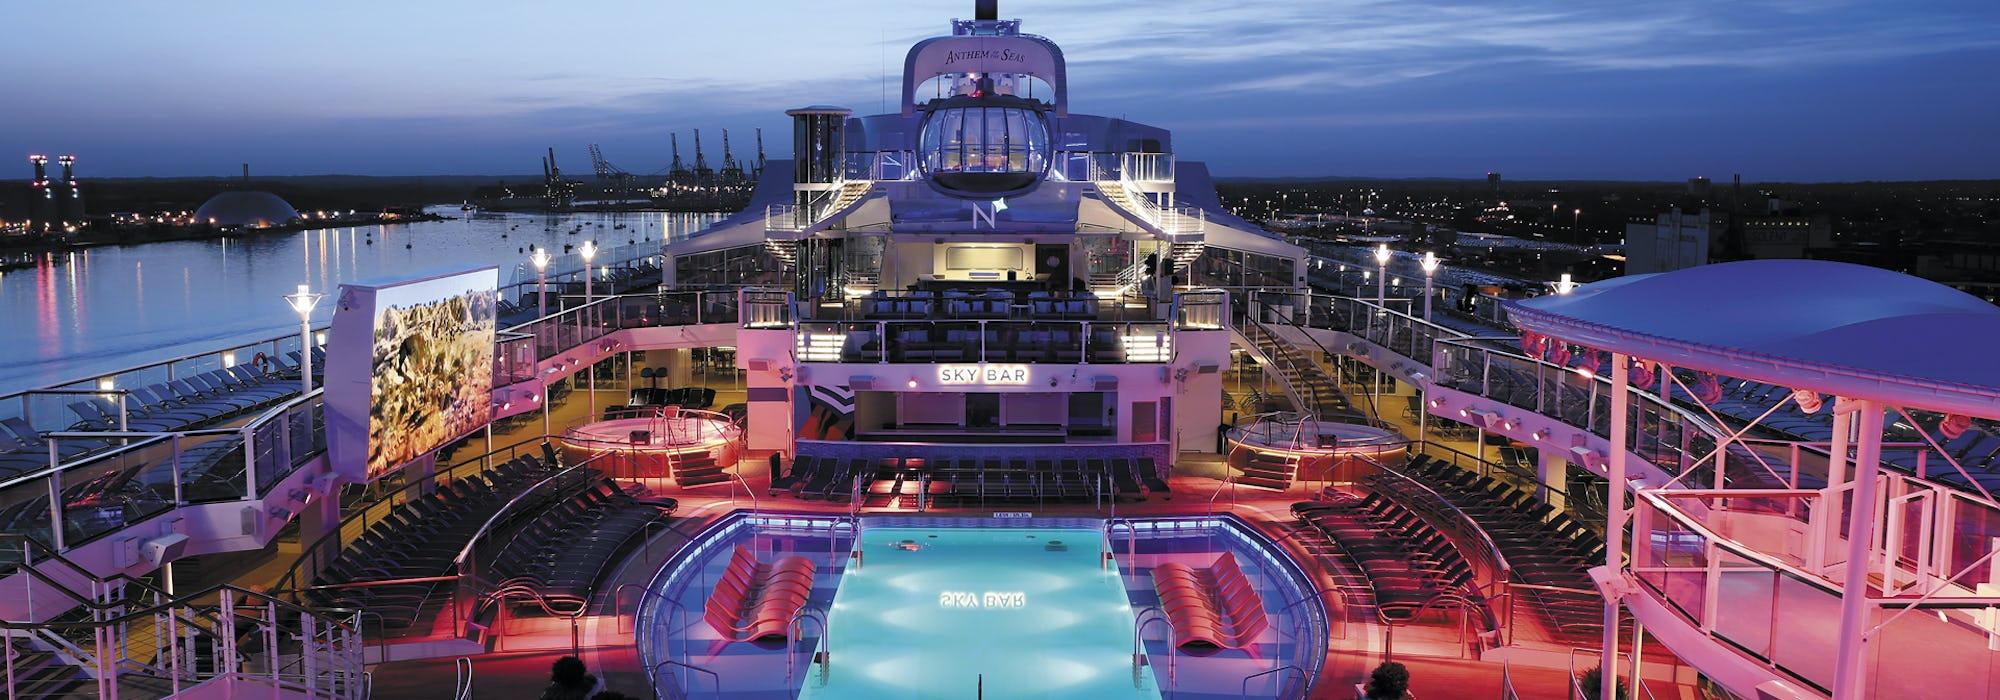 Kryssning med Odyssey of The Seas